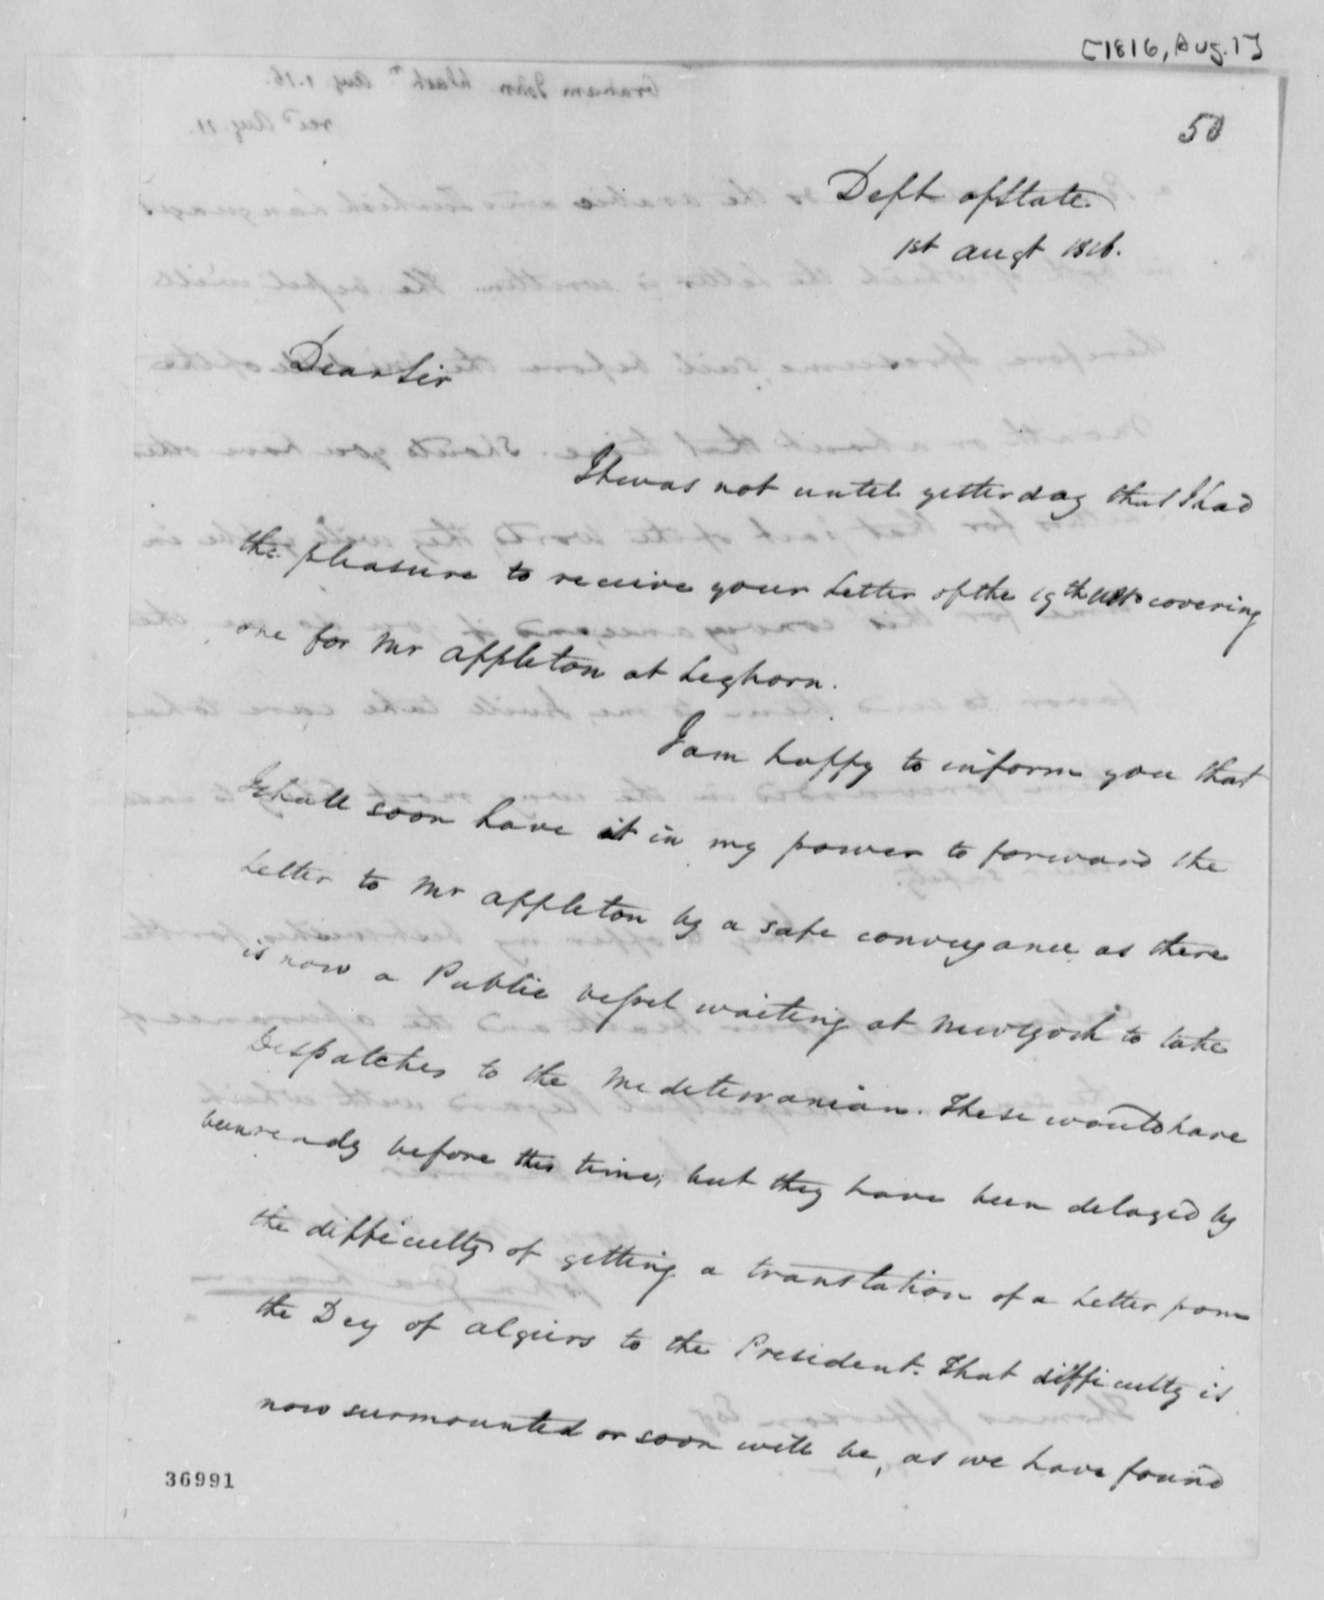 John A. Graham to Thomas Jefferson, August 1, 1816